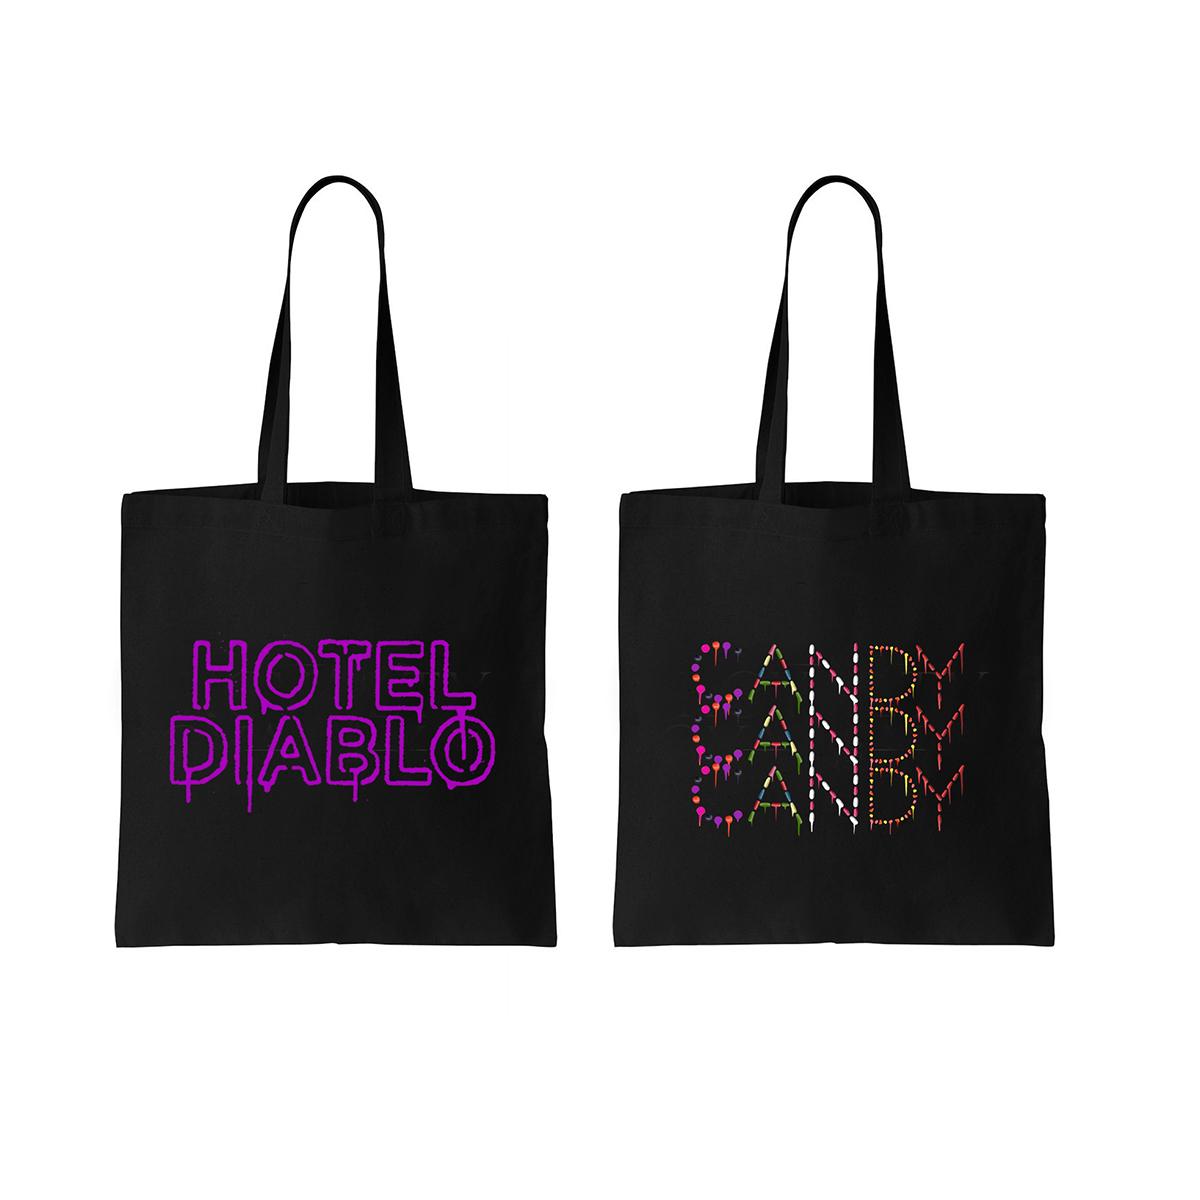 Candy Tote & Digital Album Download